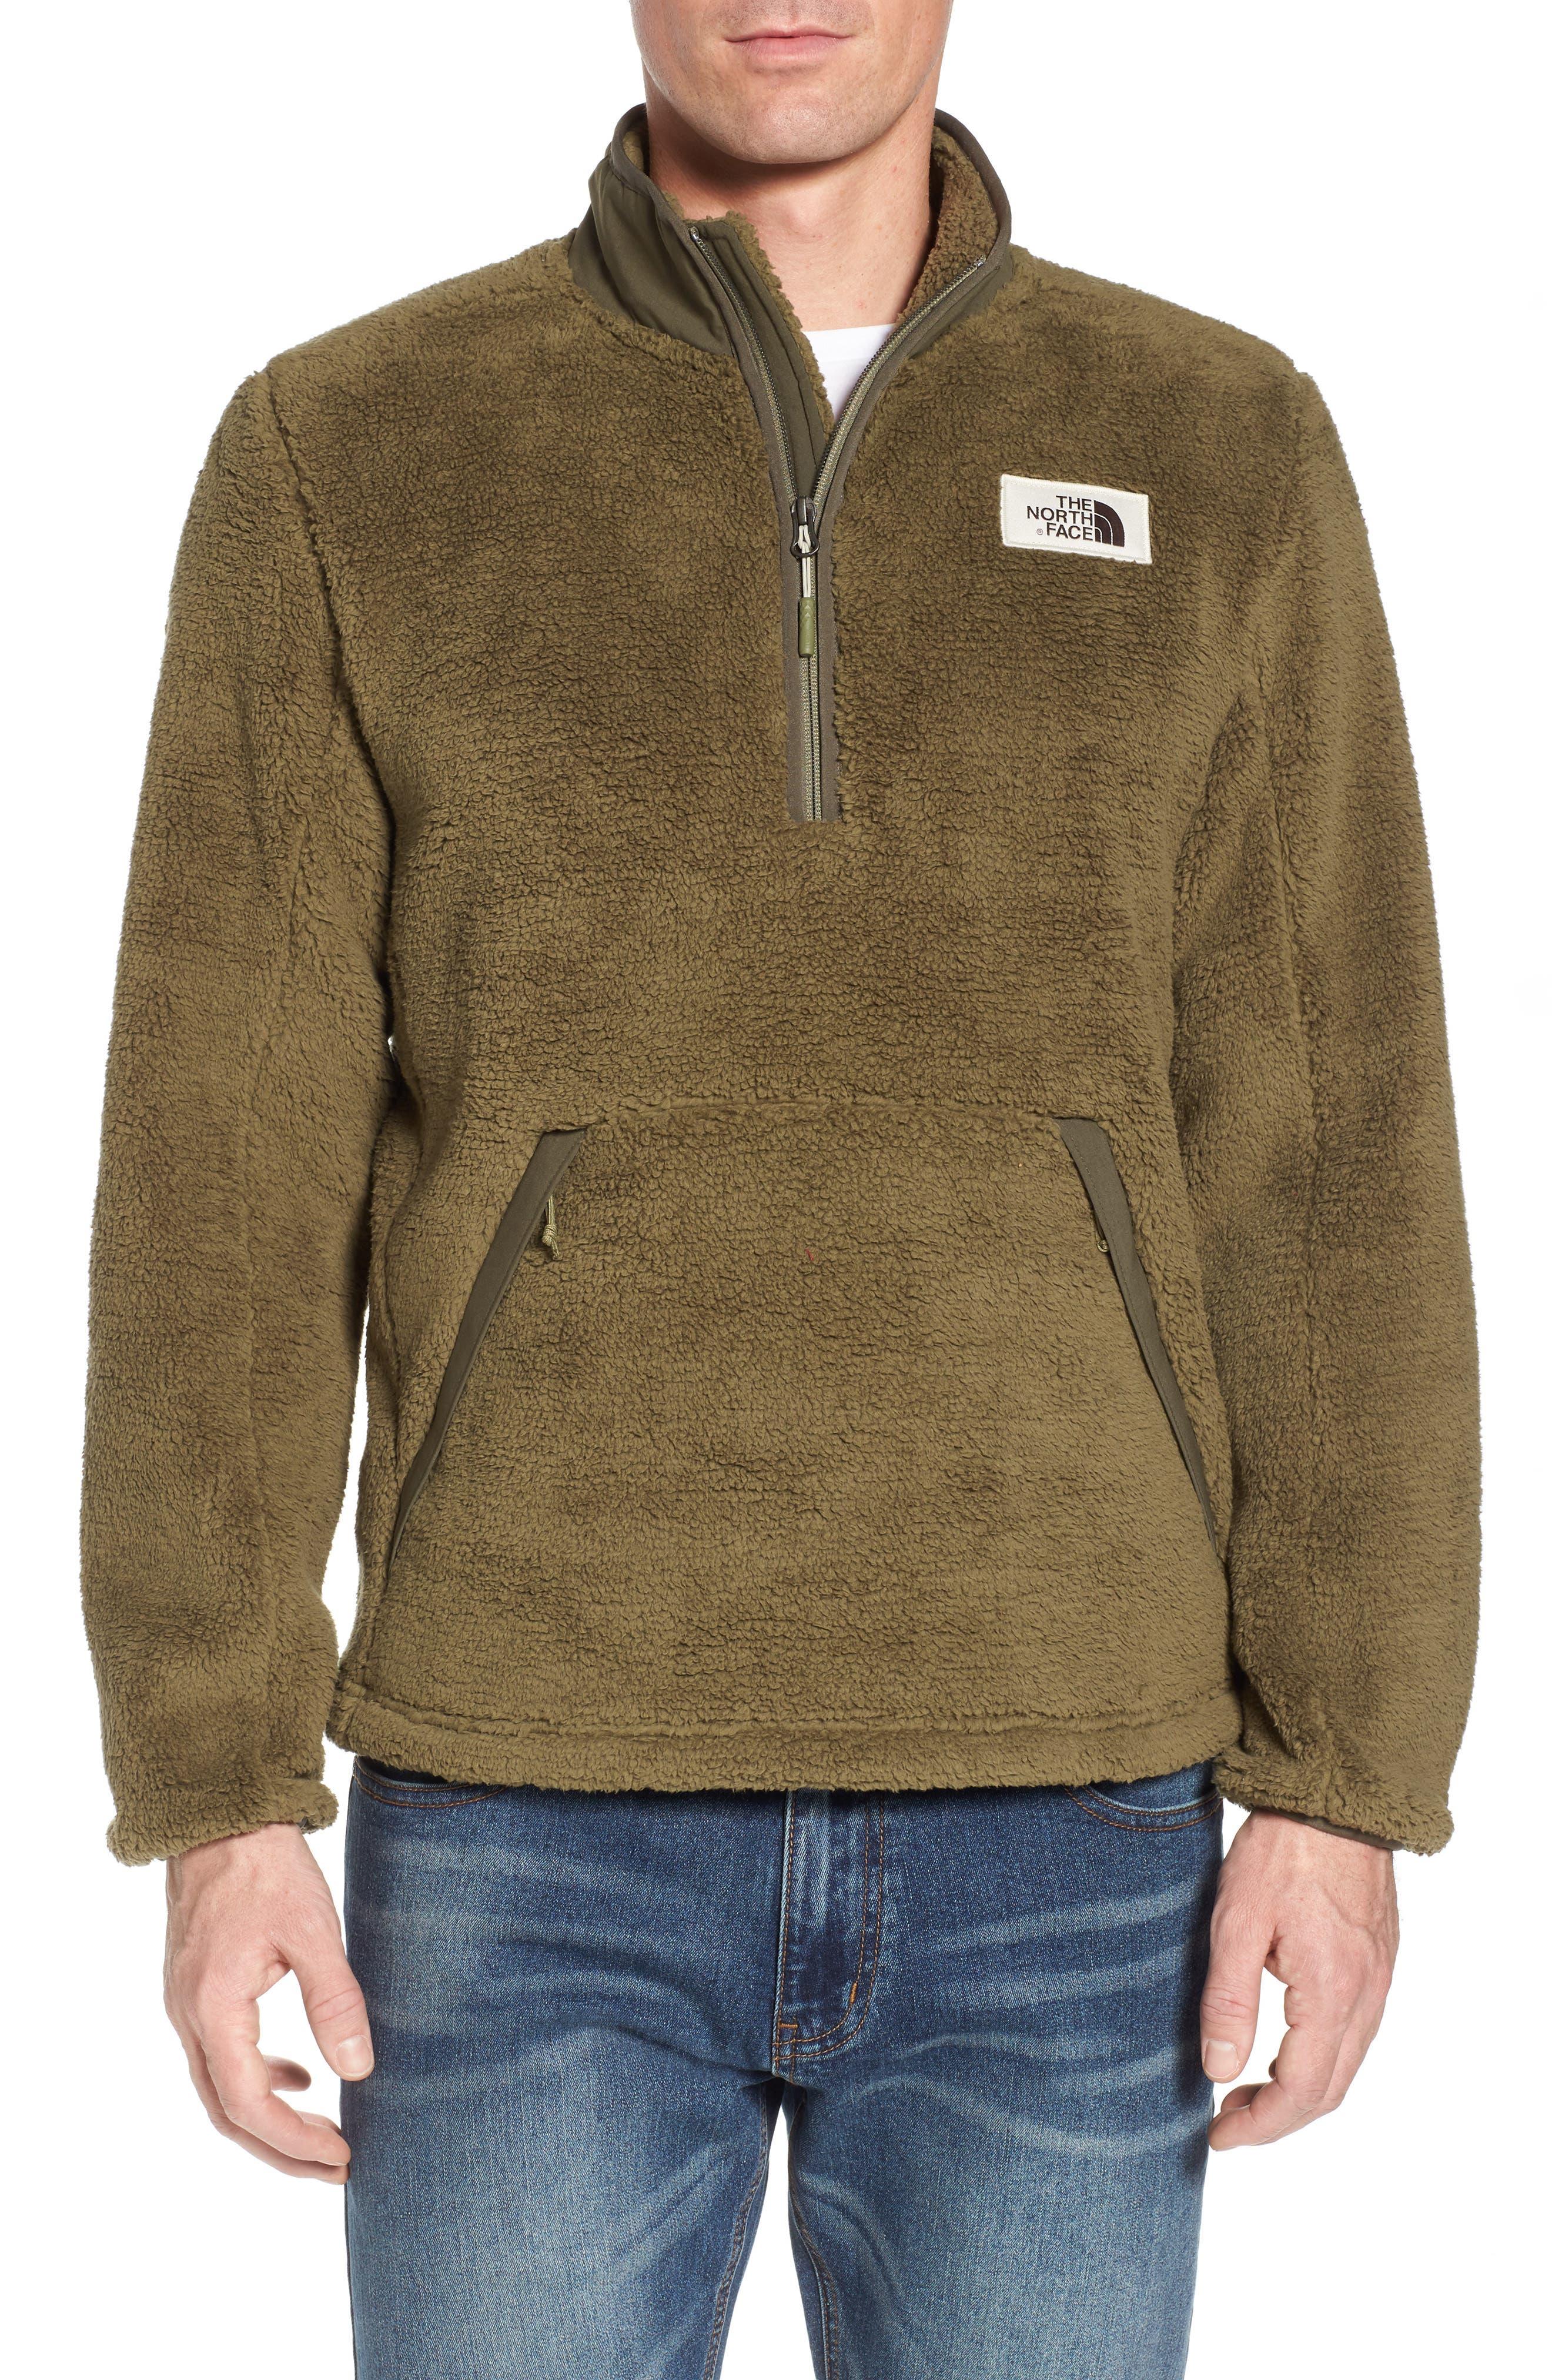 Khampfire Fleece Pullover,                         Main,                         color, Burnt Olive Green